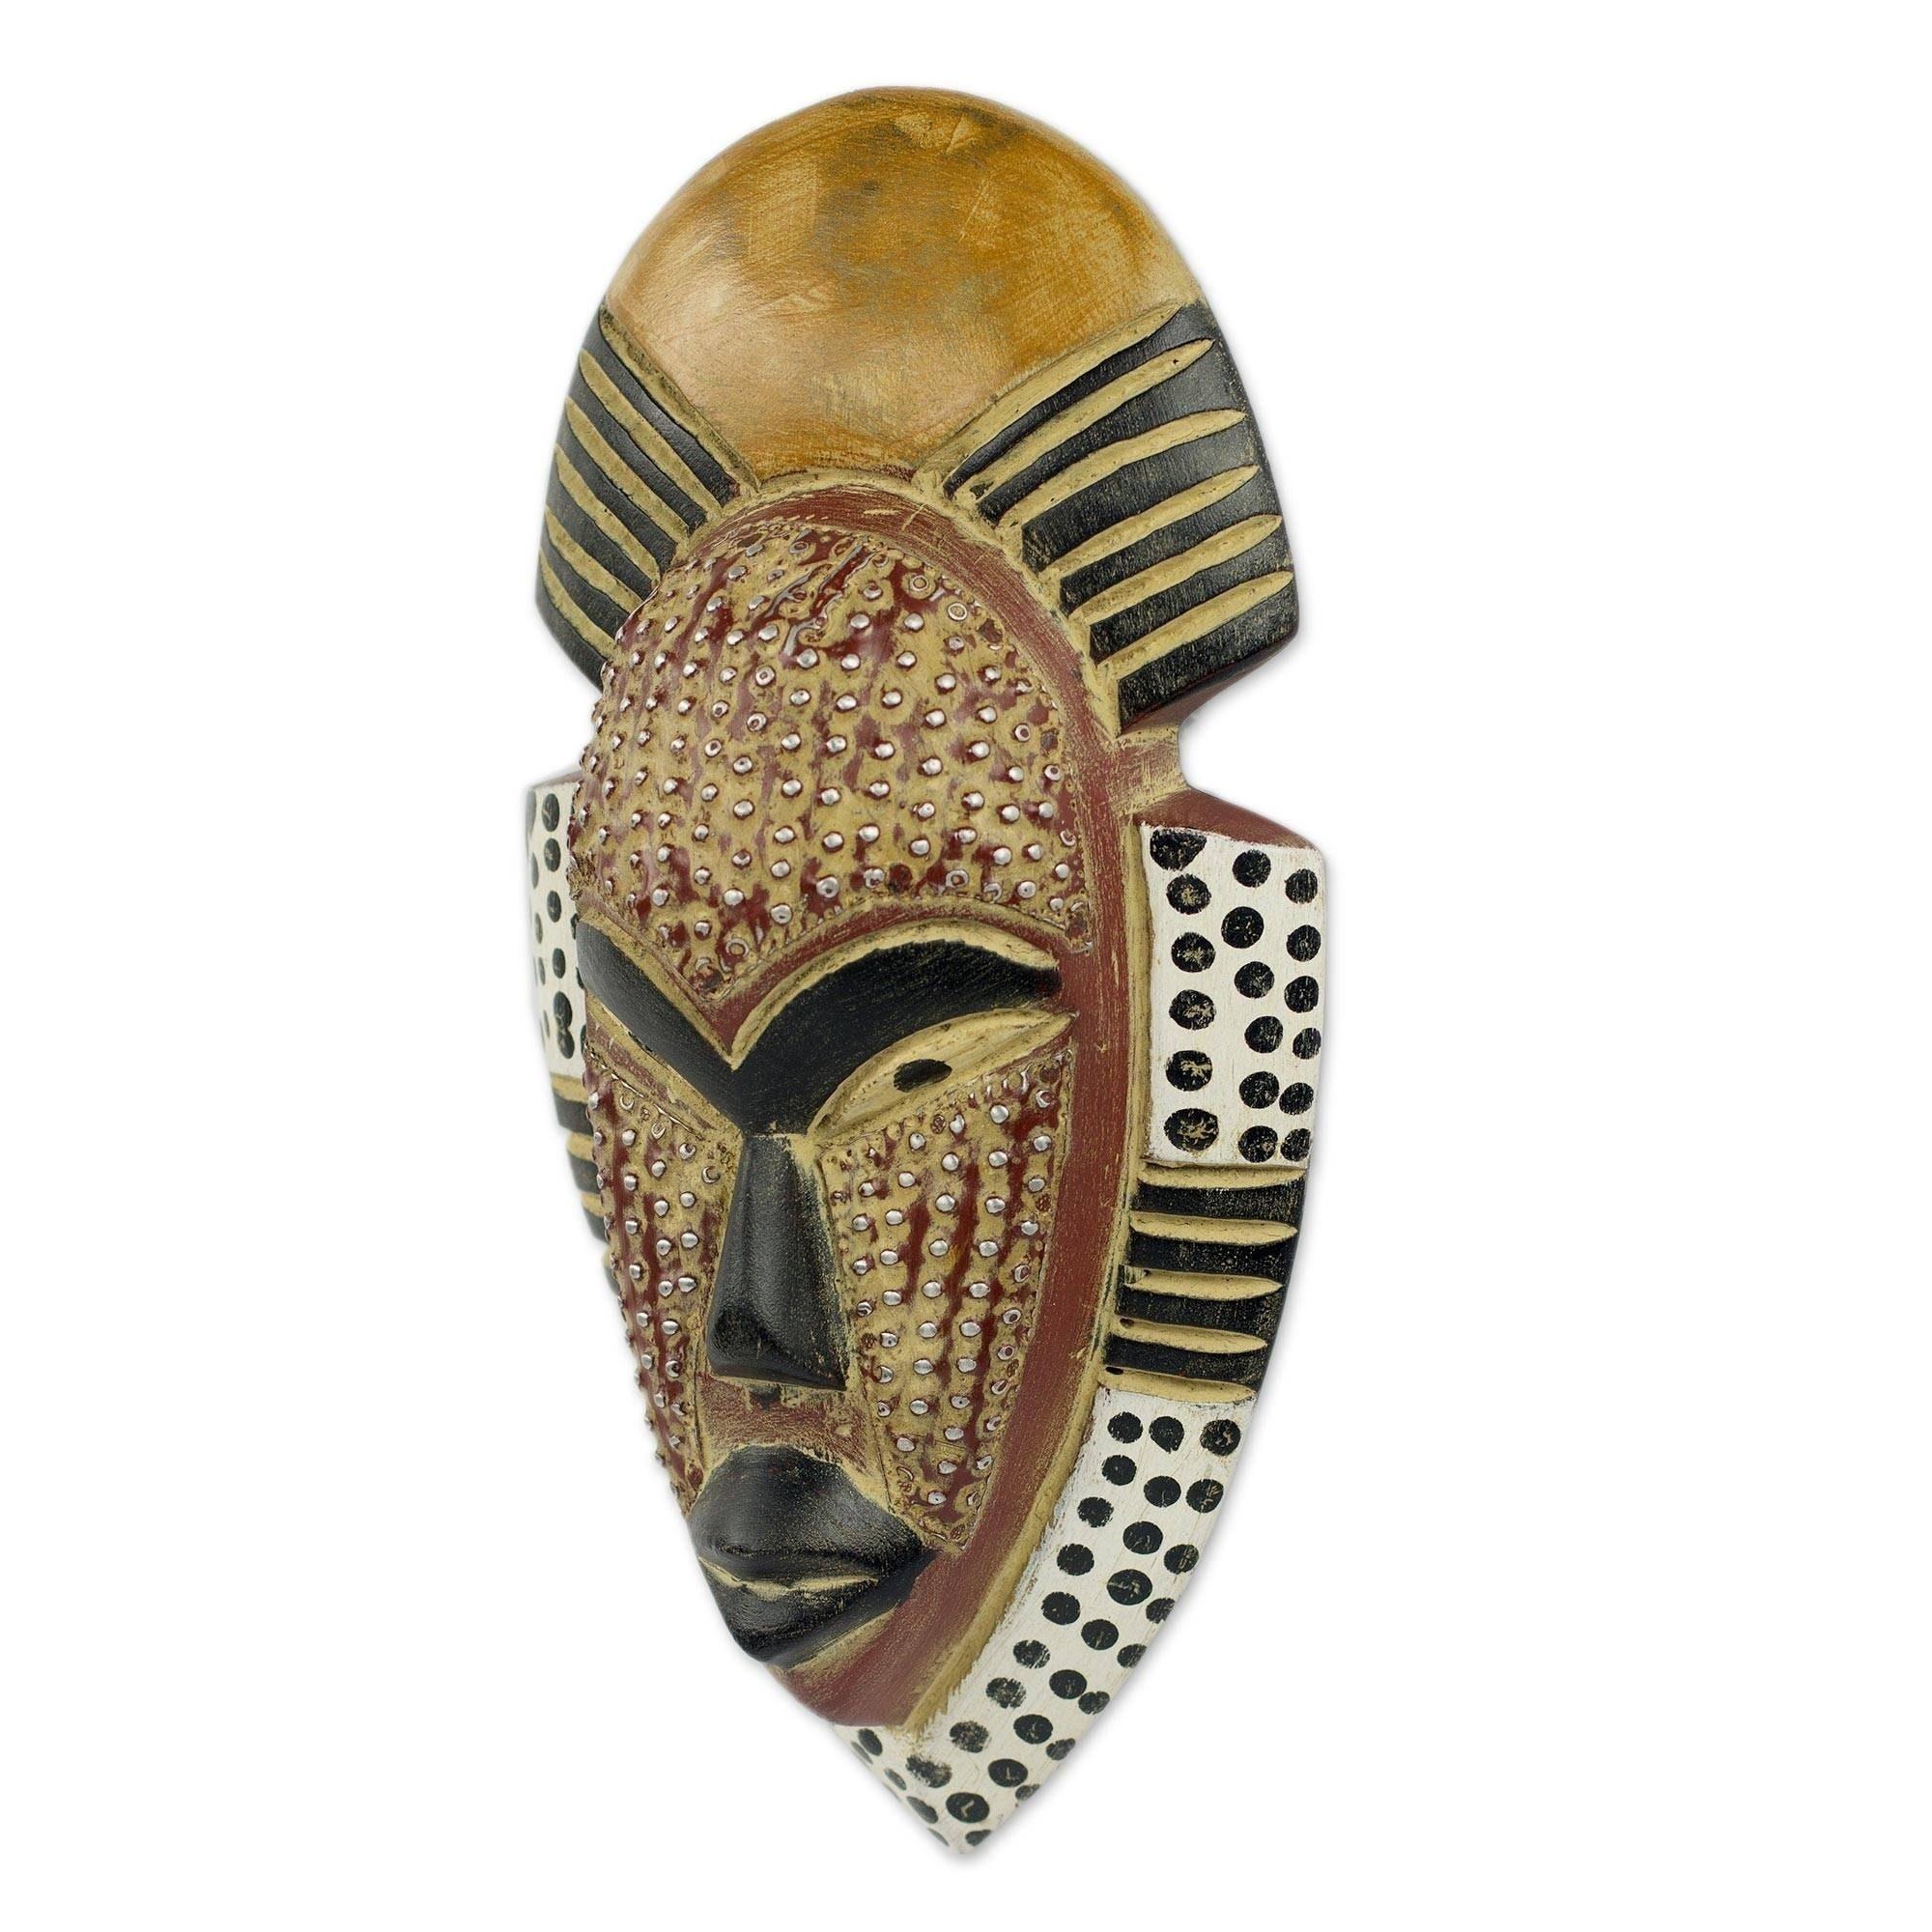 Handcrafted African Wood 'Ghana's Happiness' Mask (Ghana)